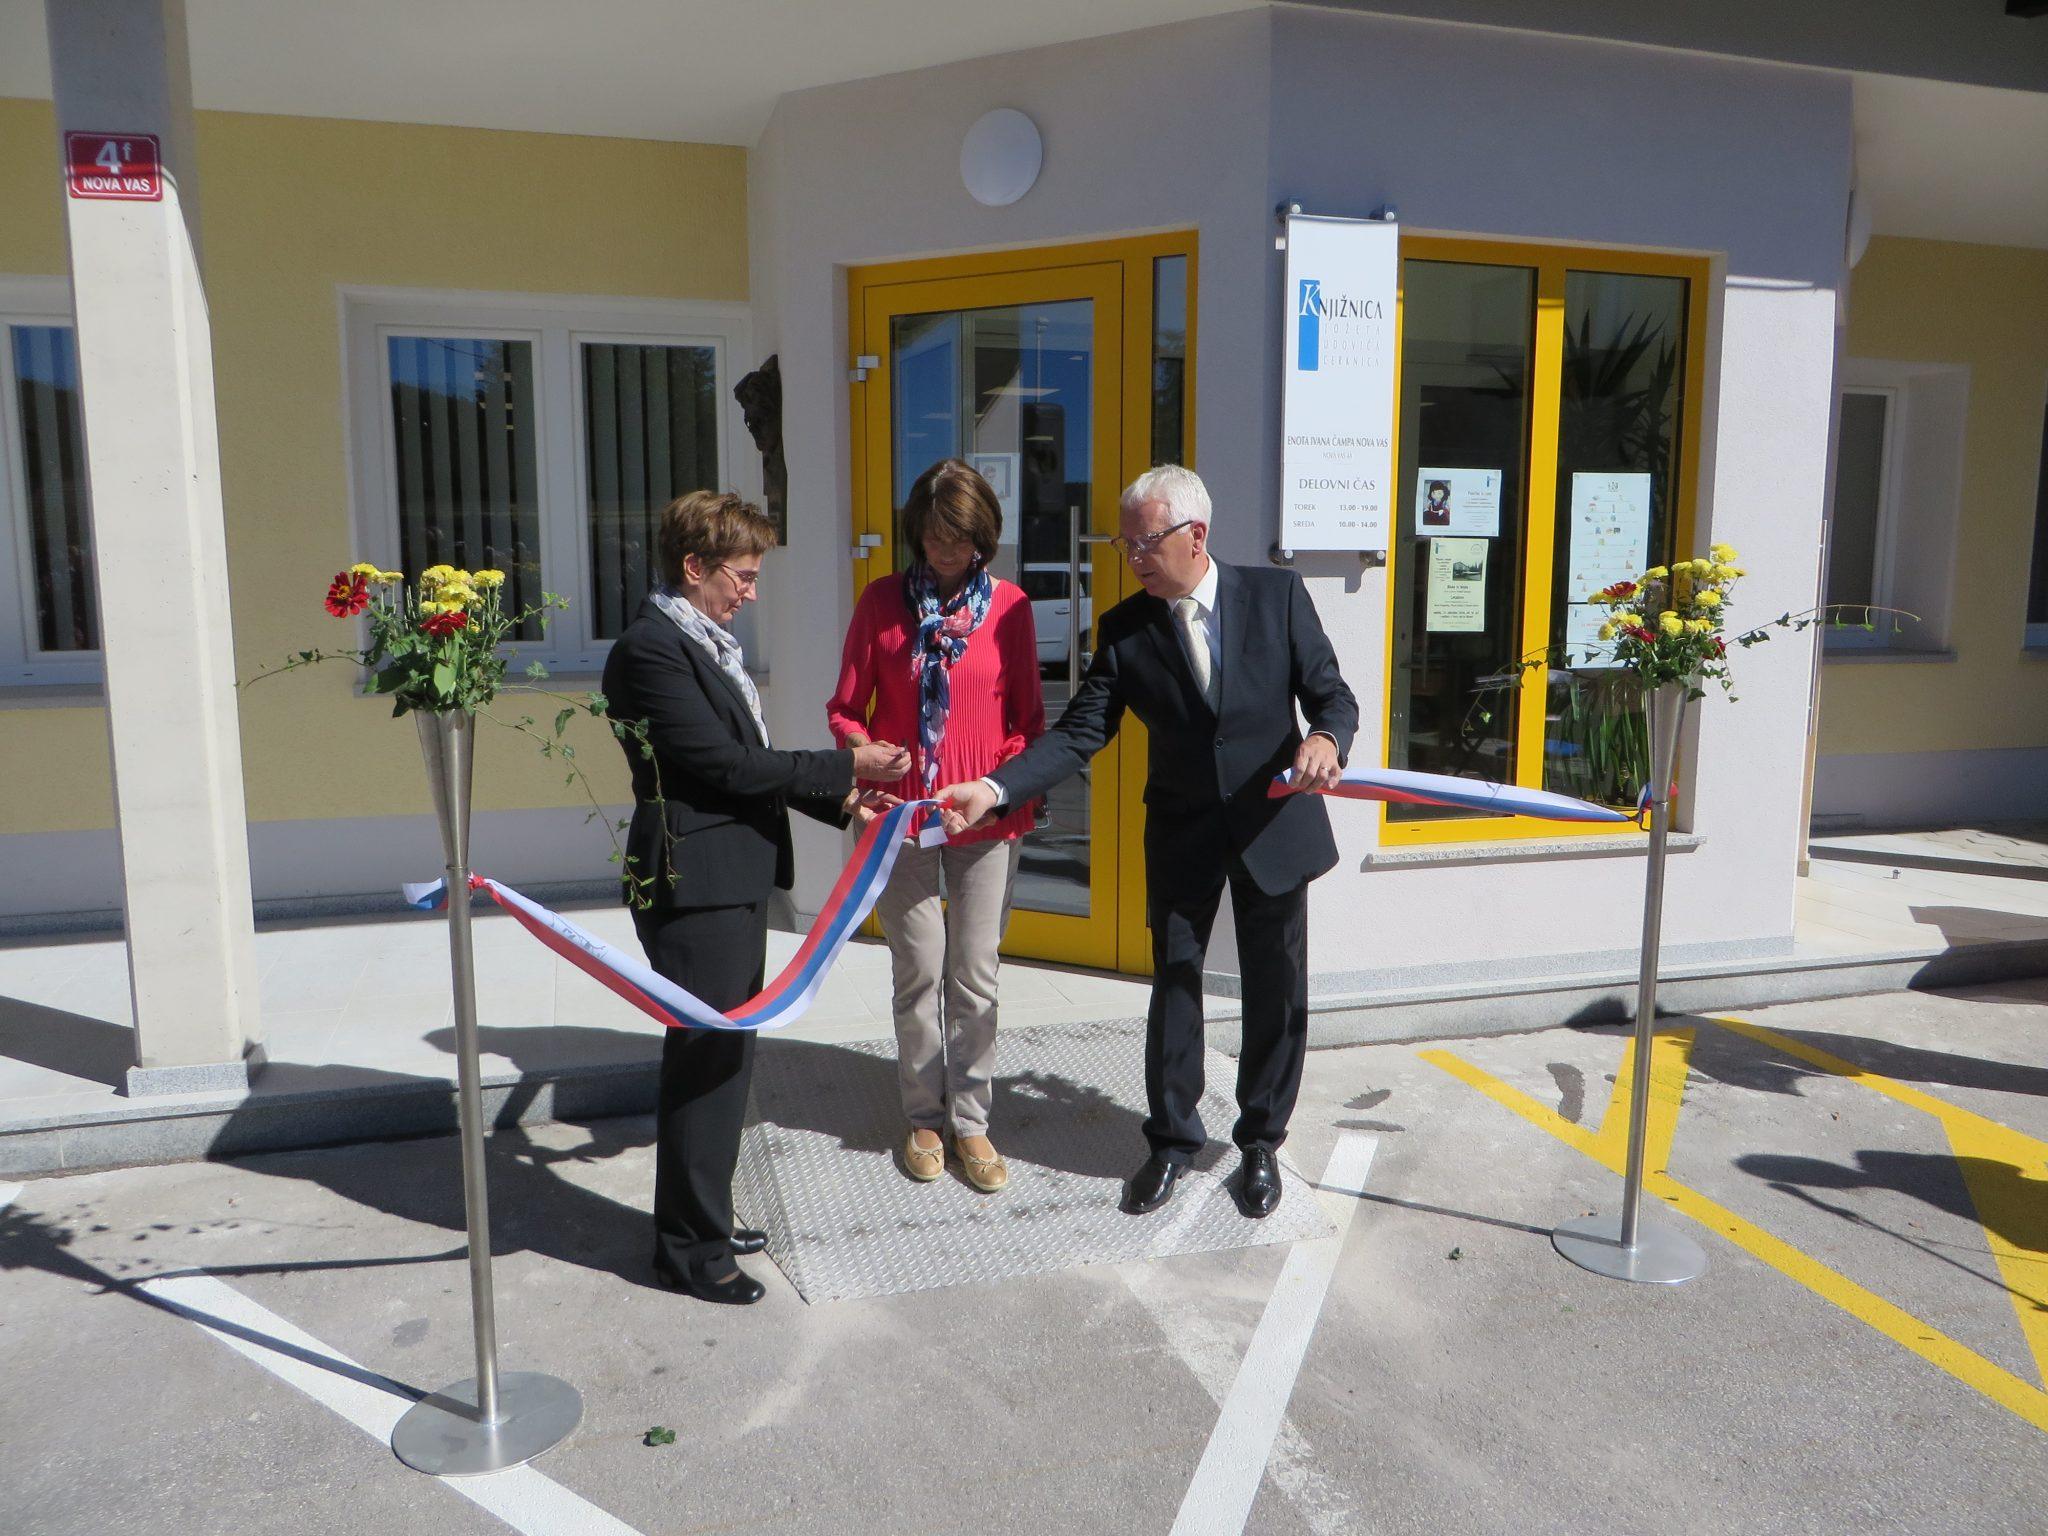 IMG 5309 - Odprtje novih prostorov KJUC – Enota Ivana Čampa Nova vas